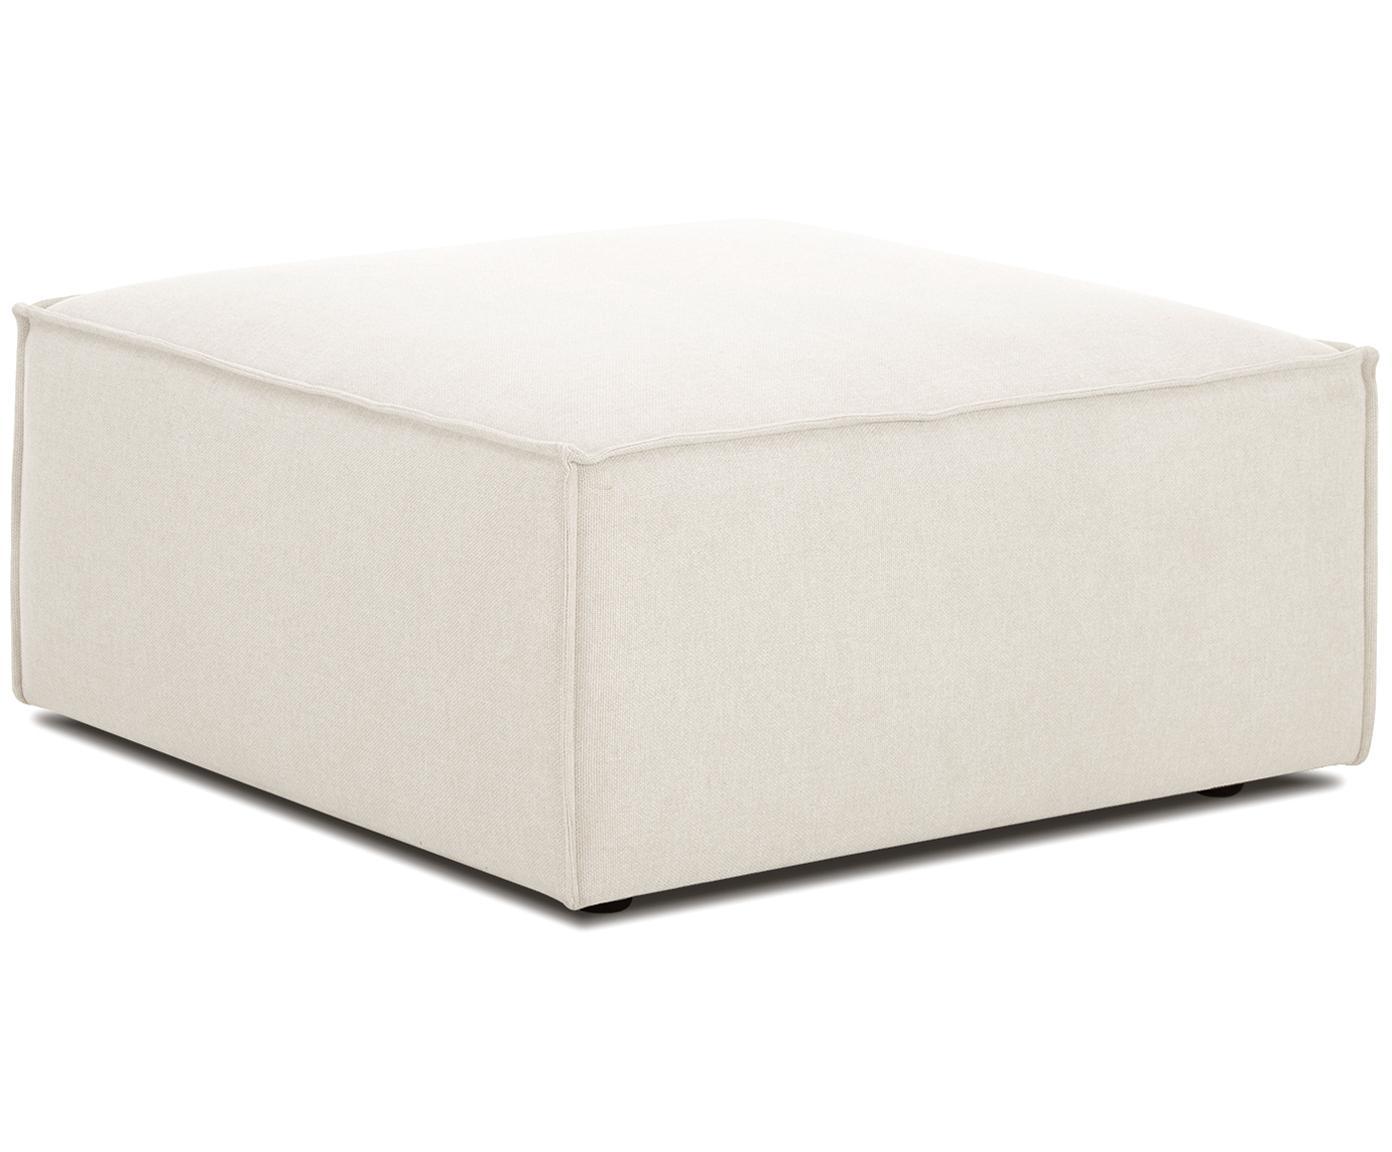 Sofa-Hocker Lennon, Bezug: Polyester 35.000 Scheuert, Gestell: Massives Kiefernholz, Spe, Webstoff Beige, 88 x 43 cm